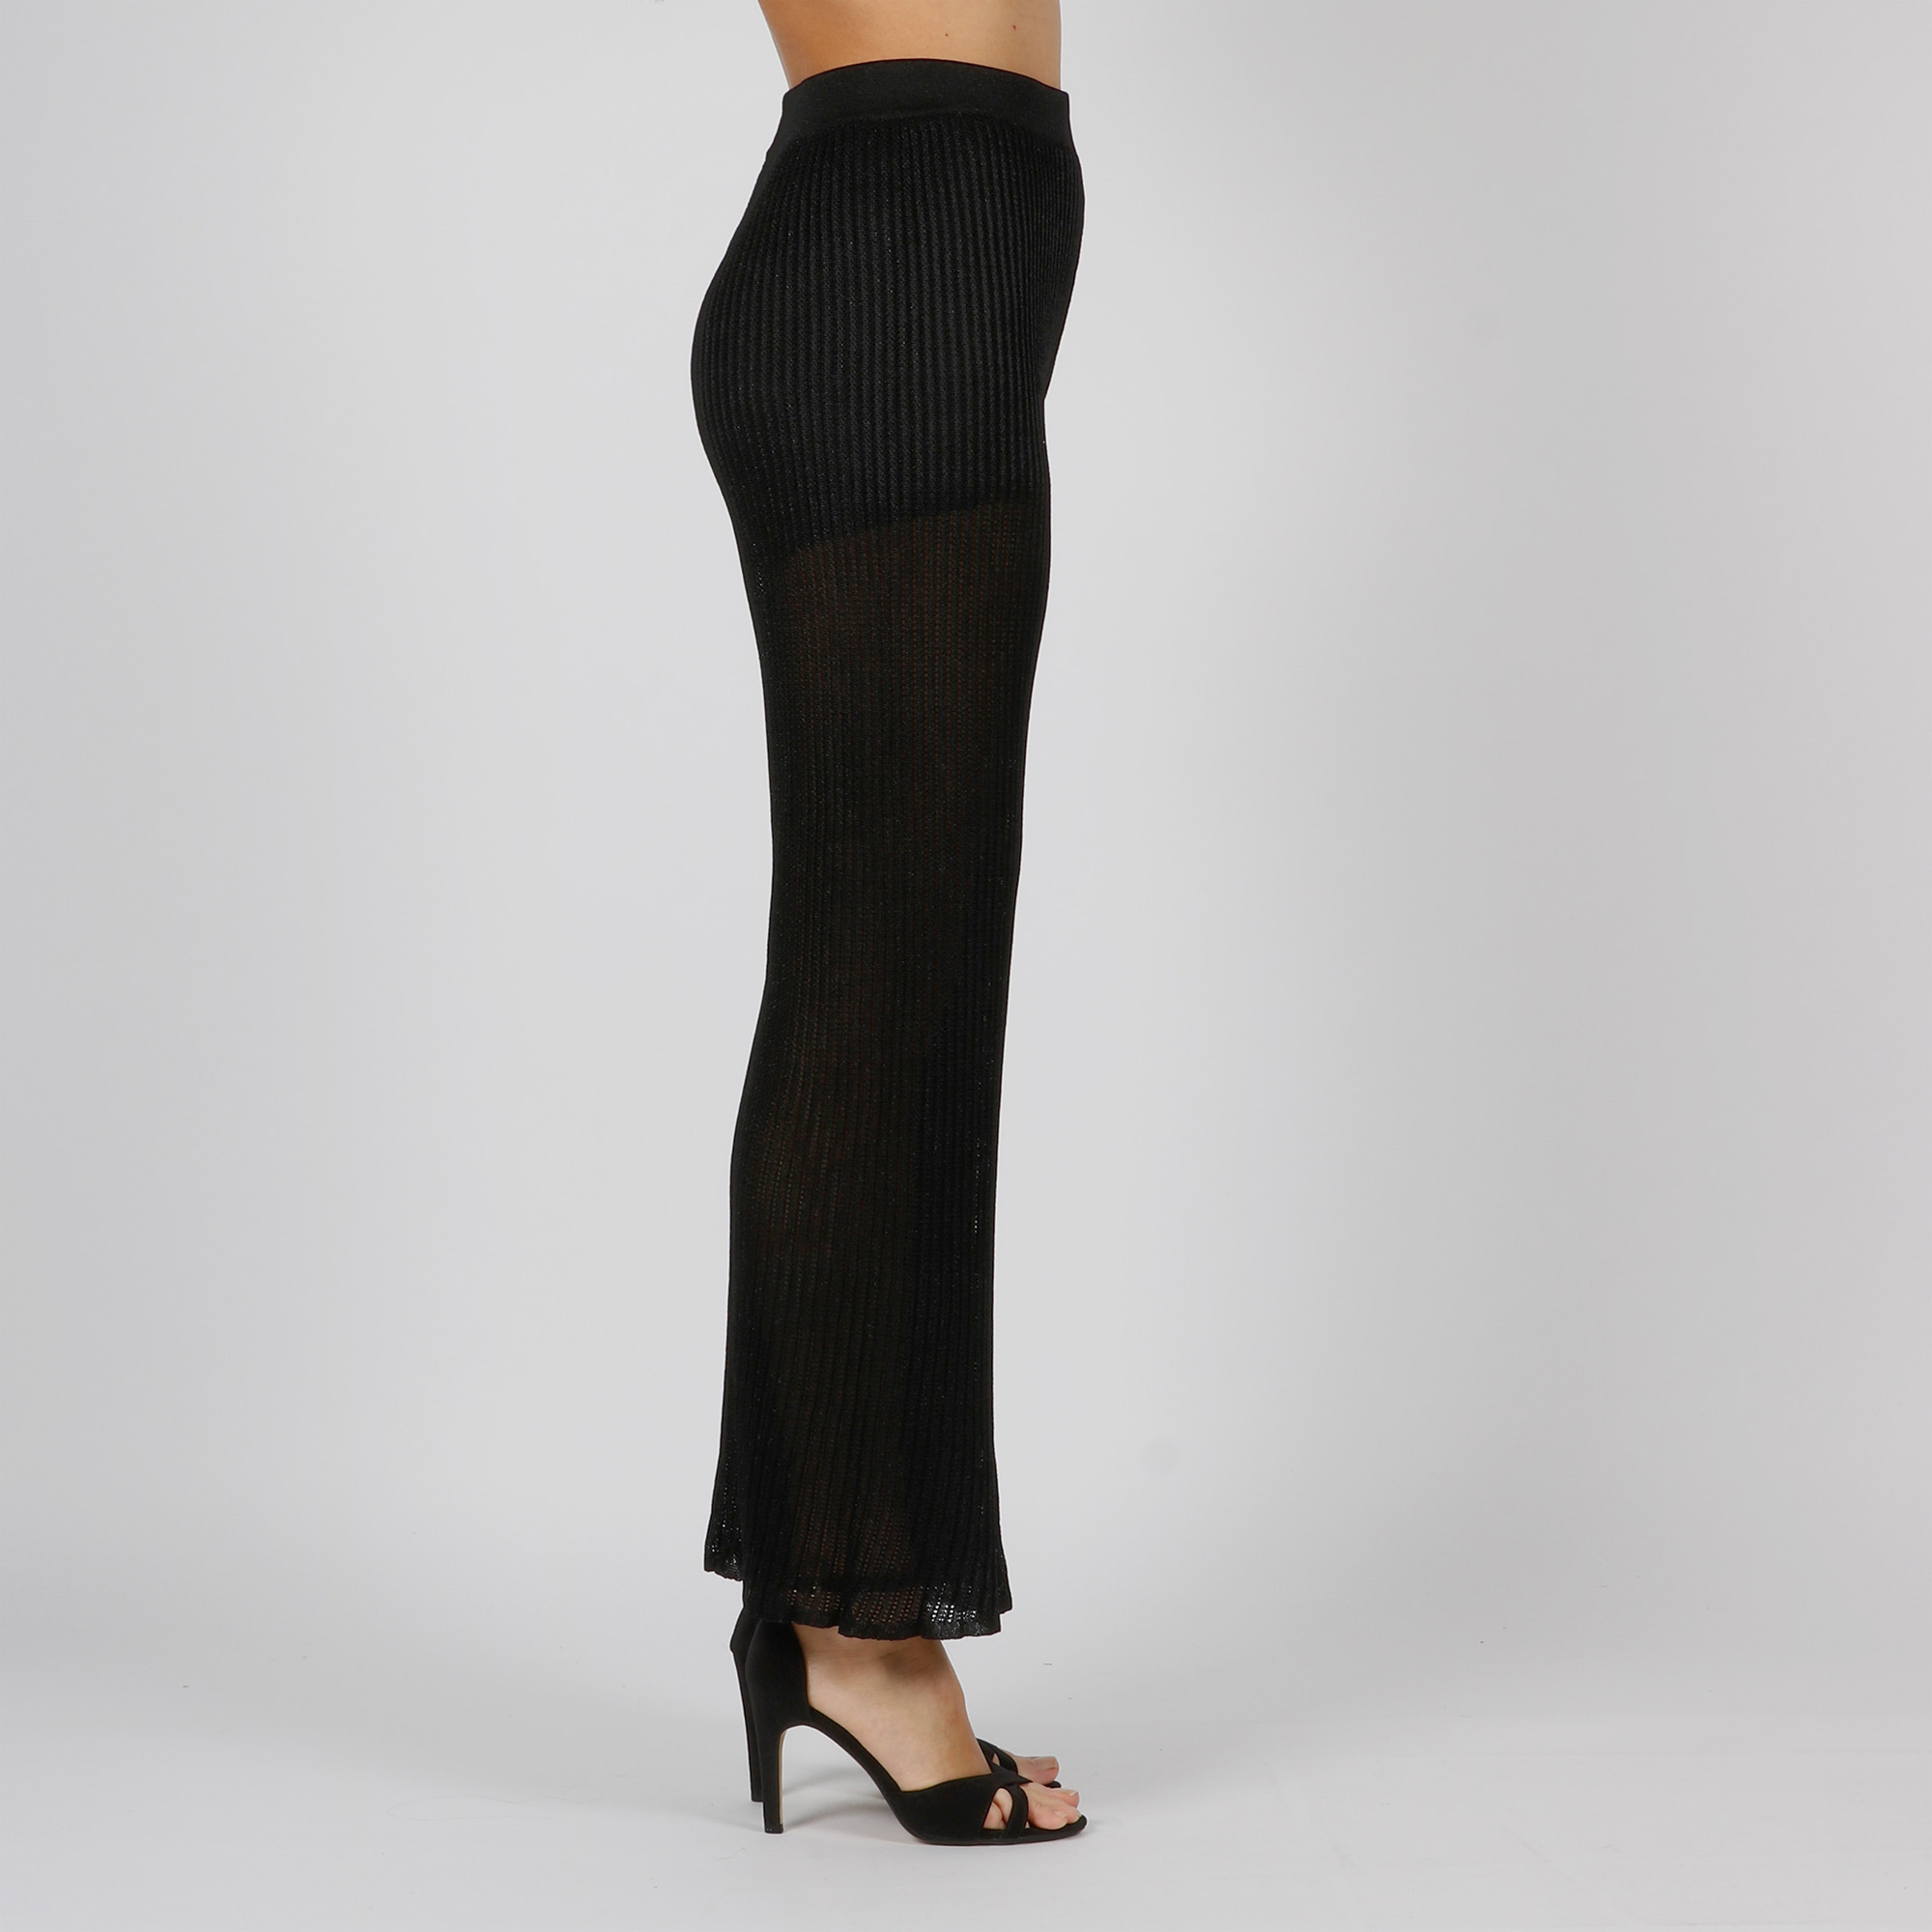 Pantalone maglia plissé - Nero